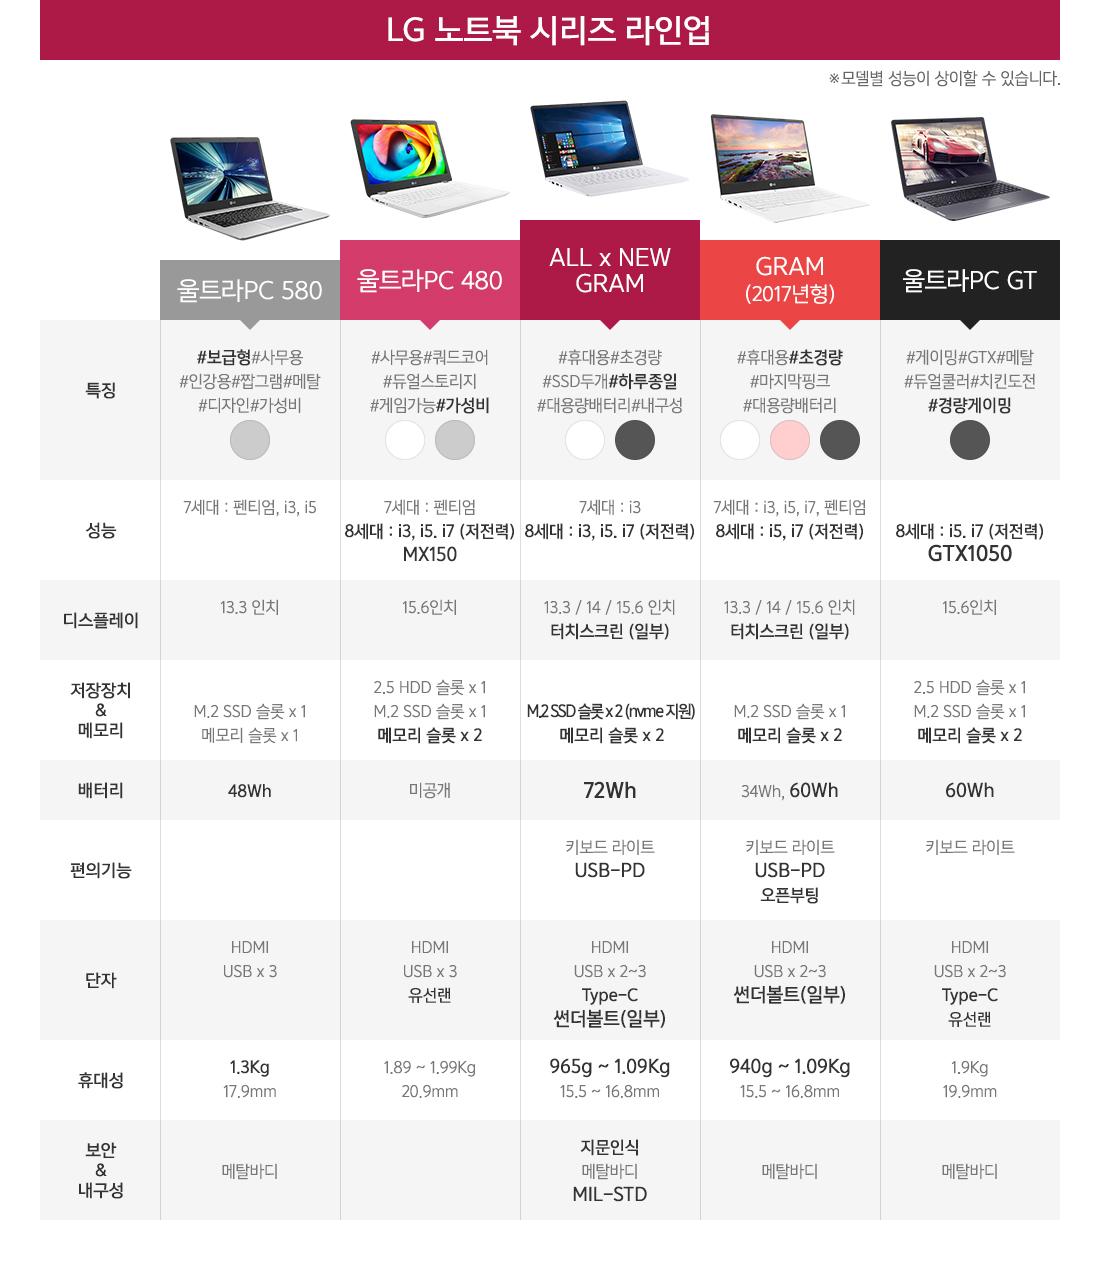 LG전자 노트북 시리즈 라인업